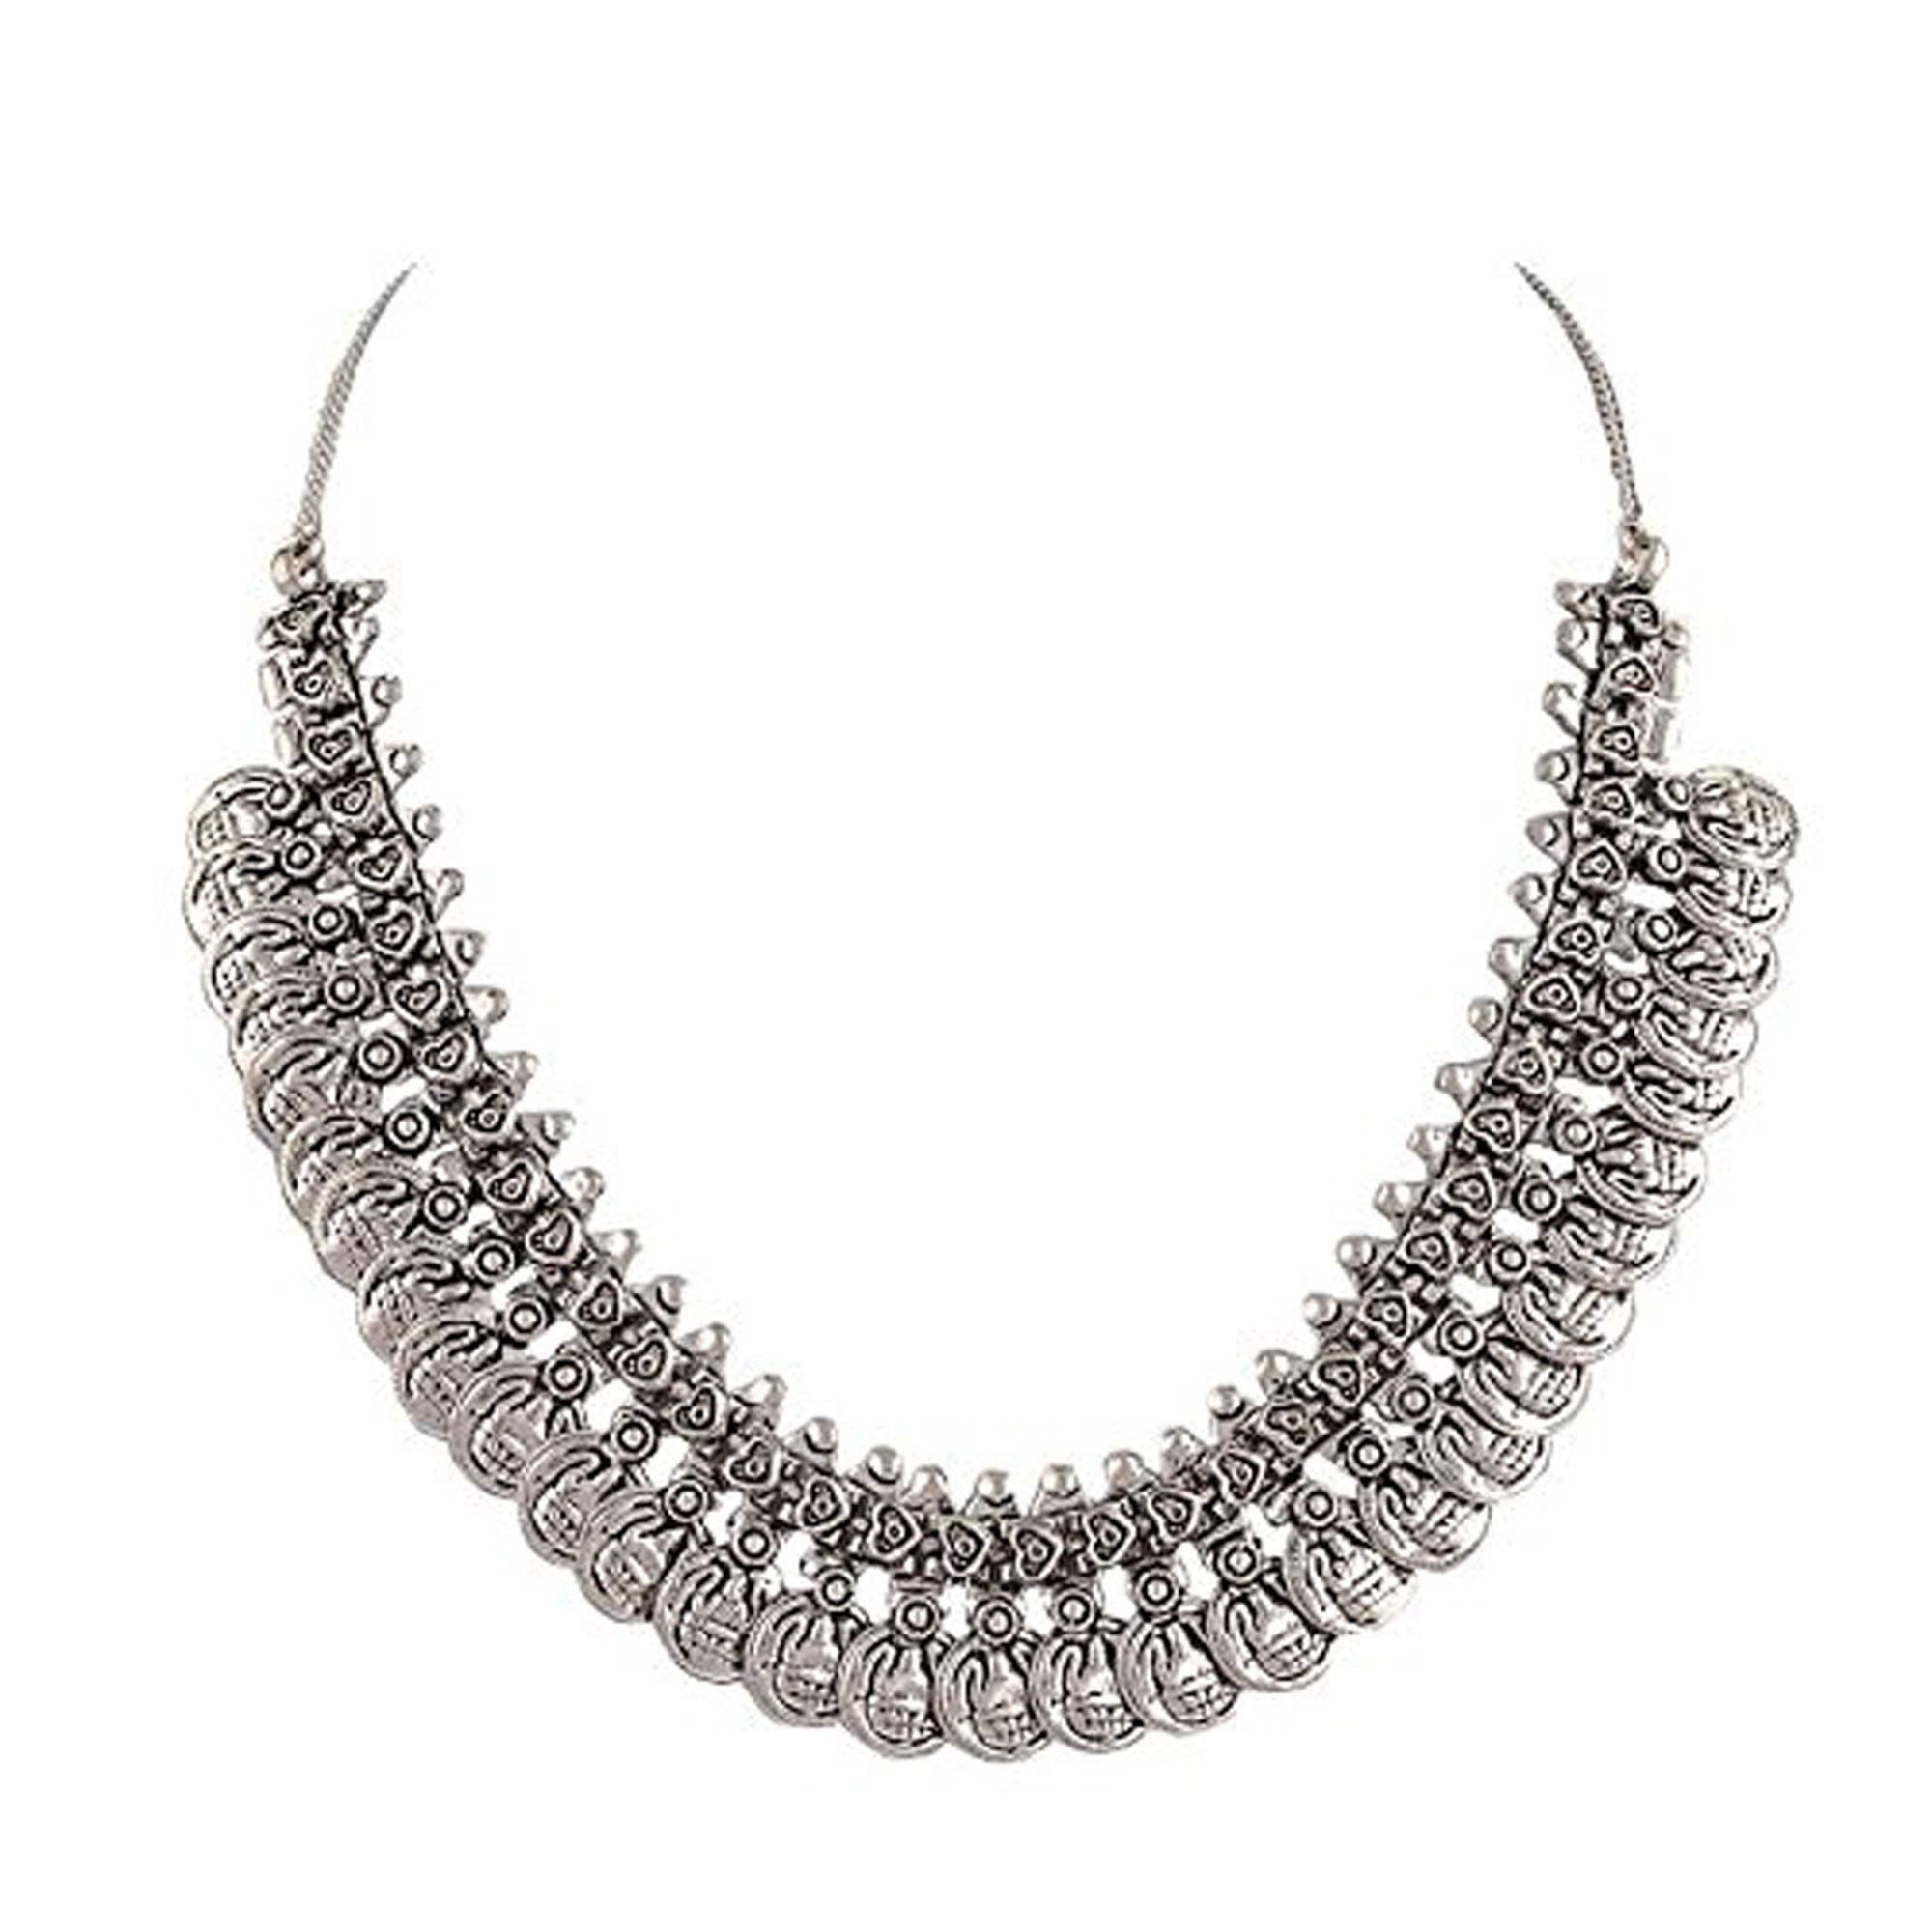 Sansar India Chain for Women (Silver) (613)